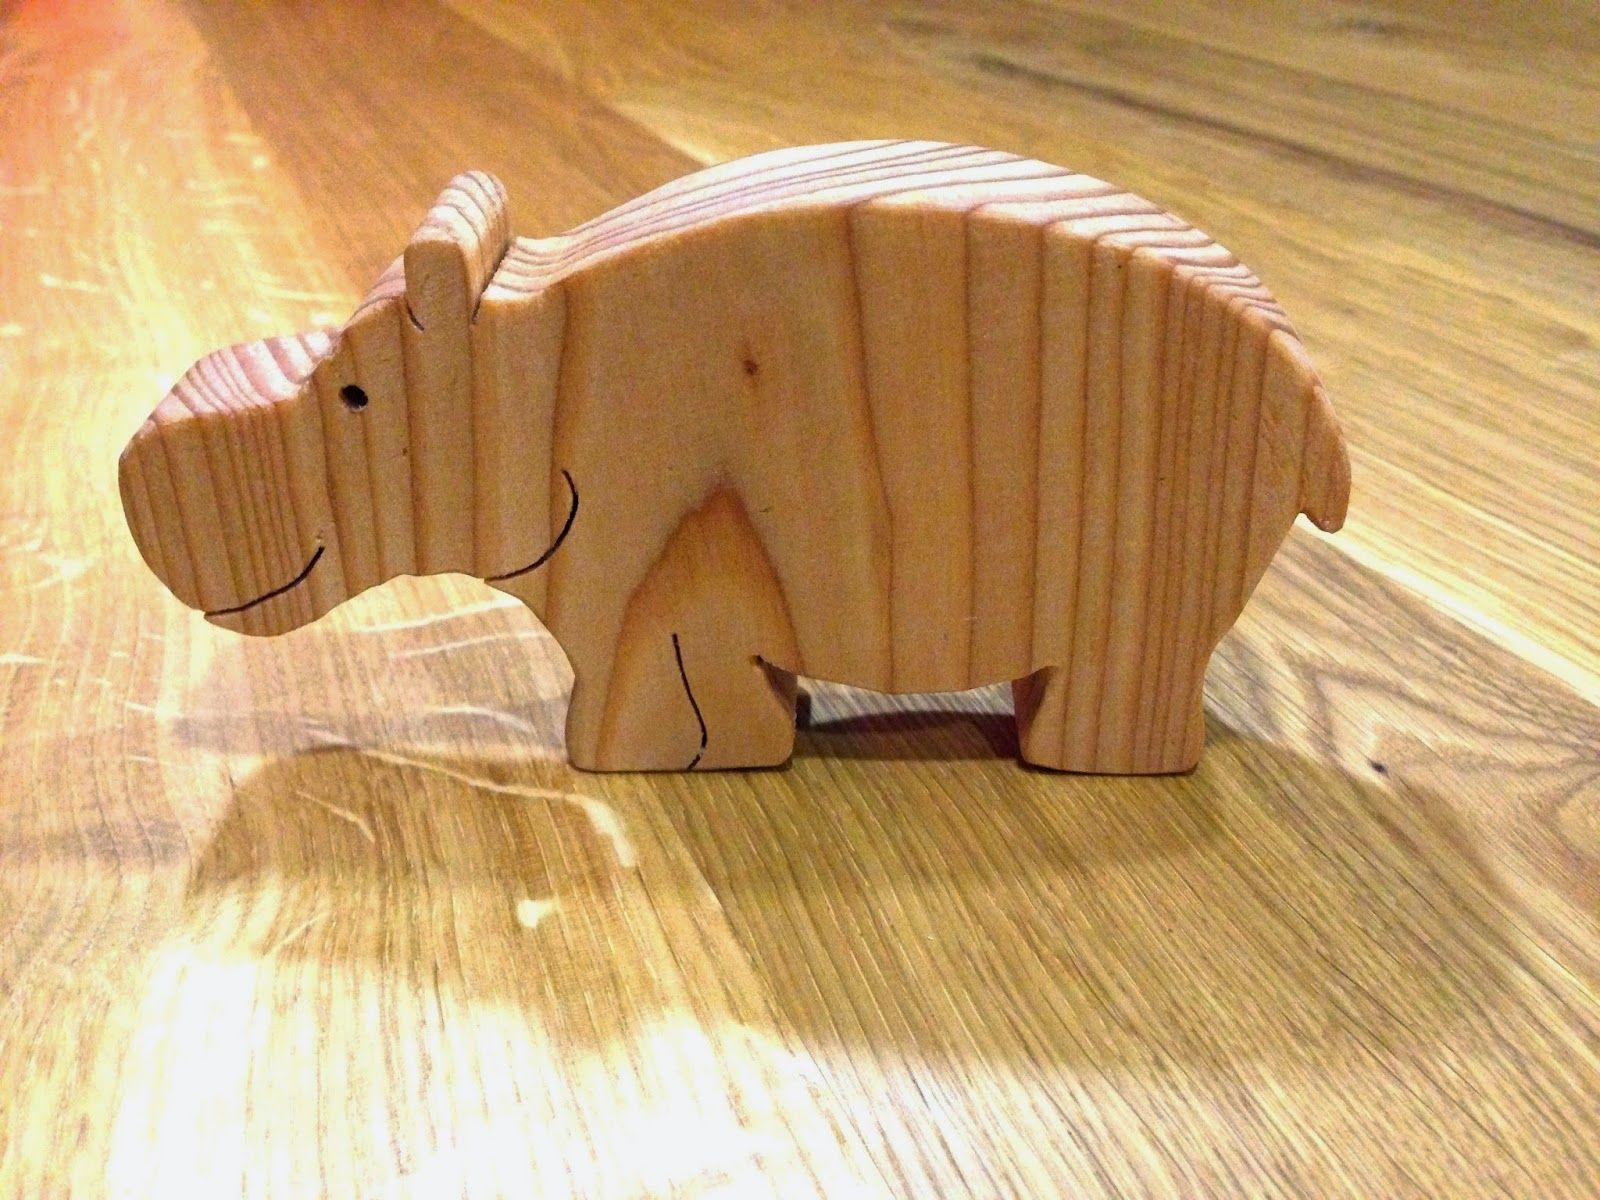 pin von egal auf gute ideen wood toys wooden toys und scroll saw. Black Bedroom Furniture Sets. Home Design Ideas